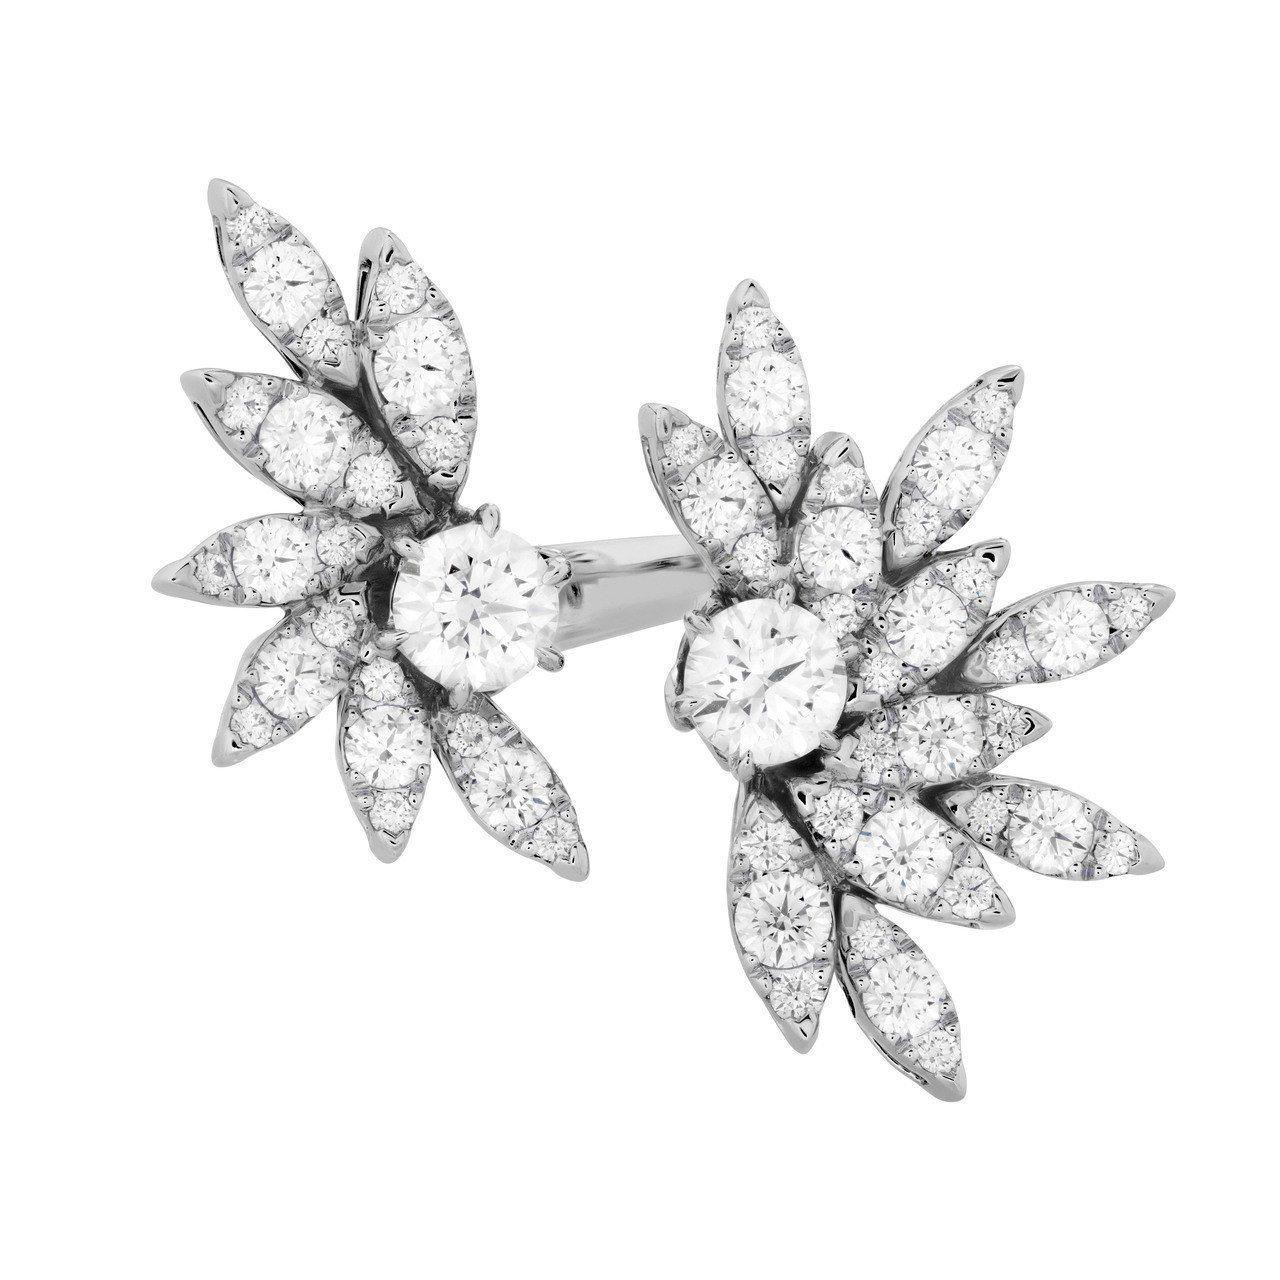 Flight鑽石戒指,鑽石總重3.13克拉,79萬6,000元。圖/ Heart...